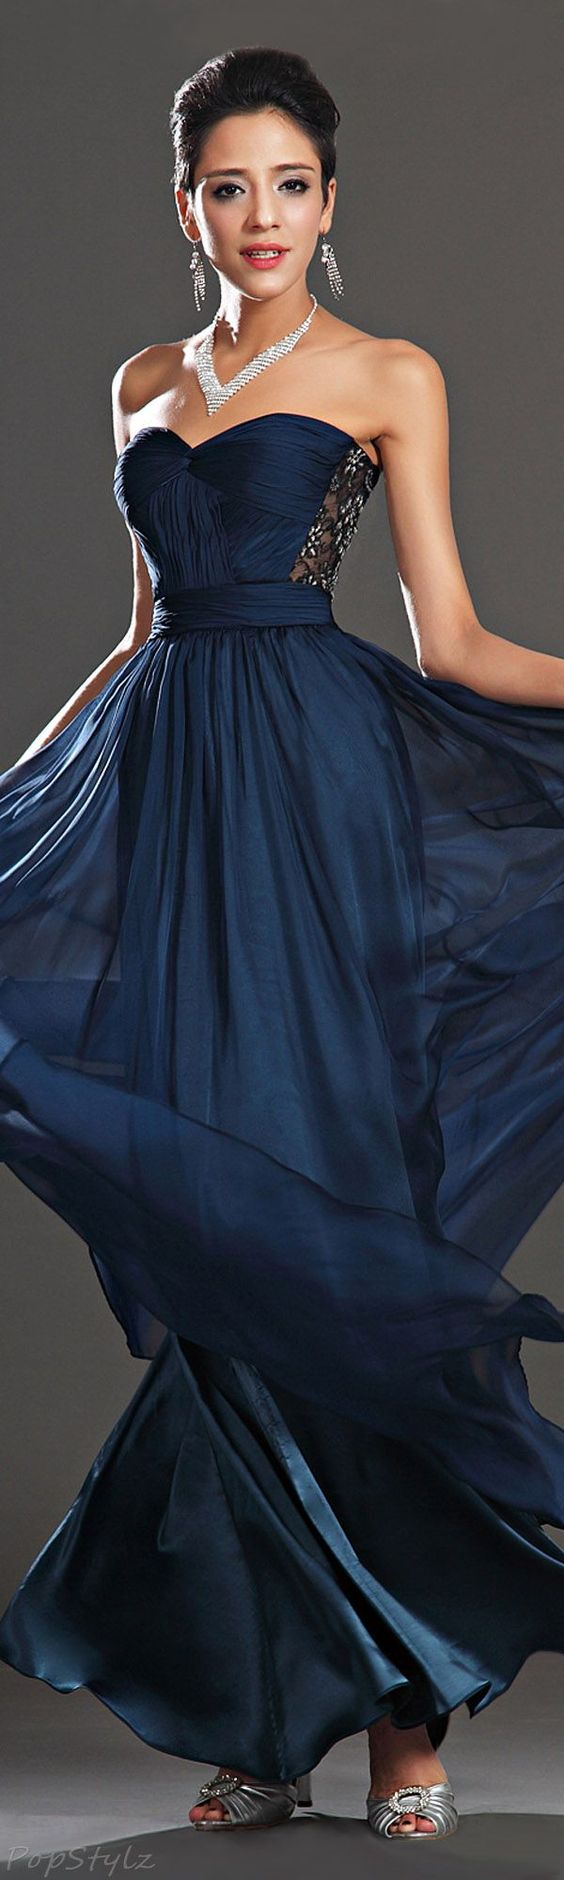 [USD 108.42] eDressit New Gorgeous Lace Strapless Evening Dress (00135705)